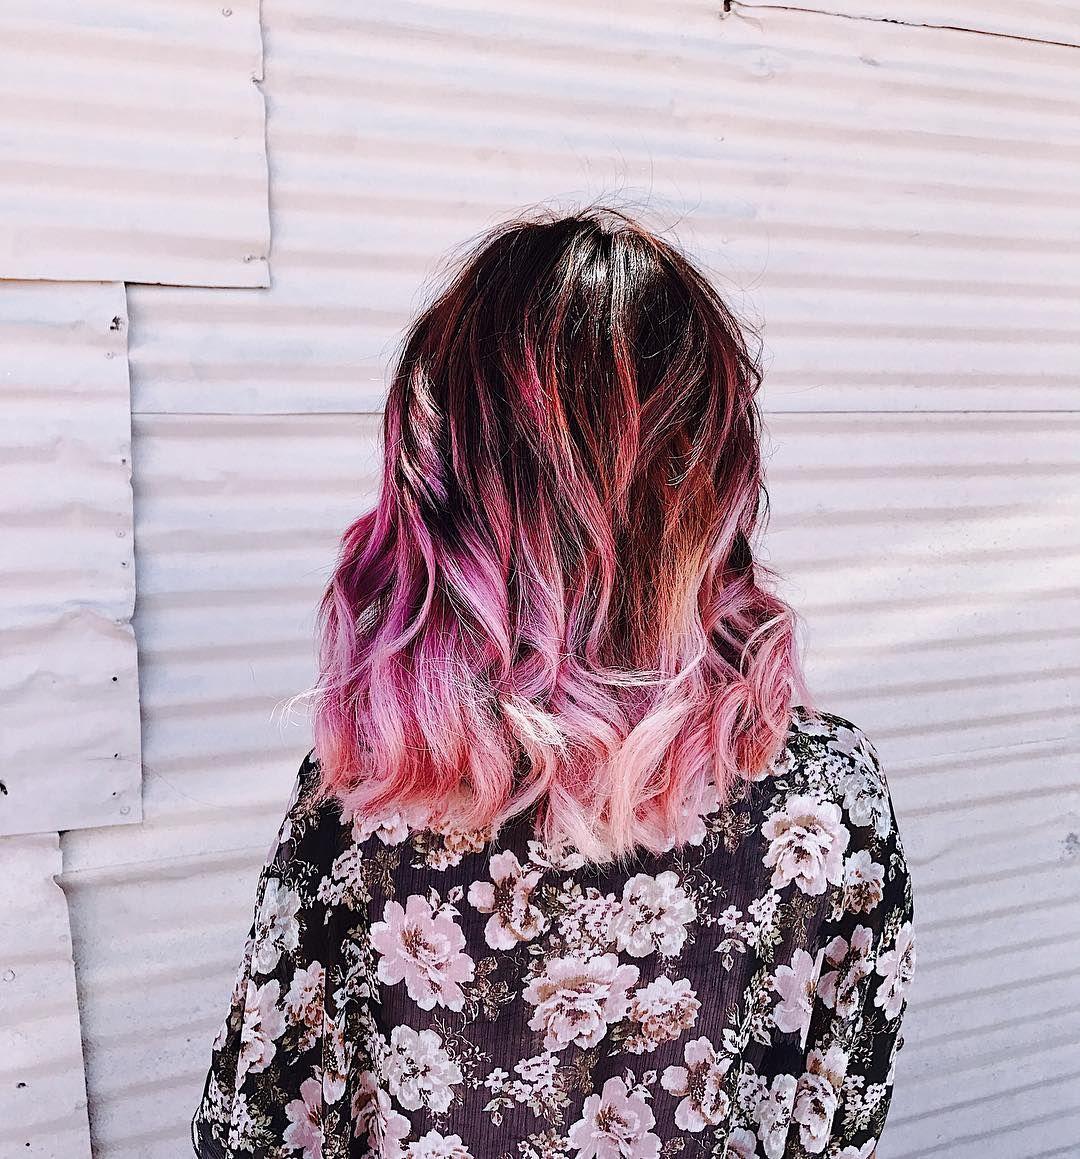 26 отметок «Нравится», 3 комментариев — nea | odessa | virgo🌙 (@nea.in.wonderland) в Instagram: «It feels so good to have pink hair again 😌🦄💕»